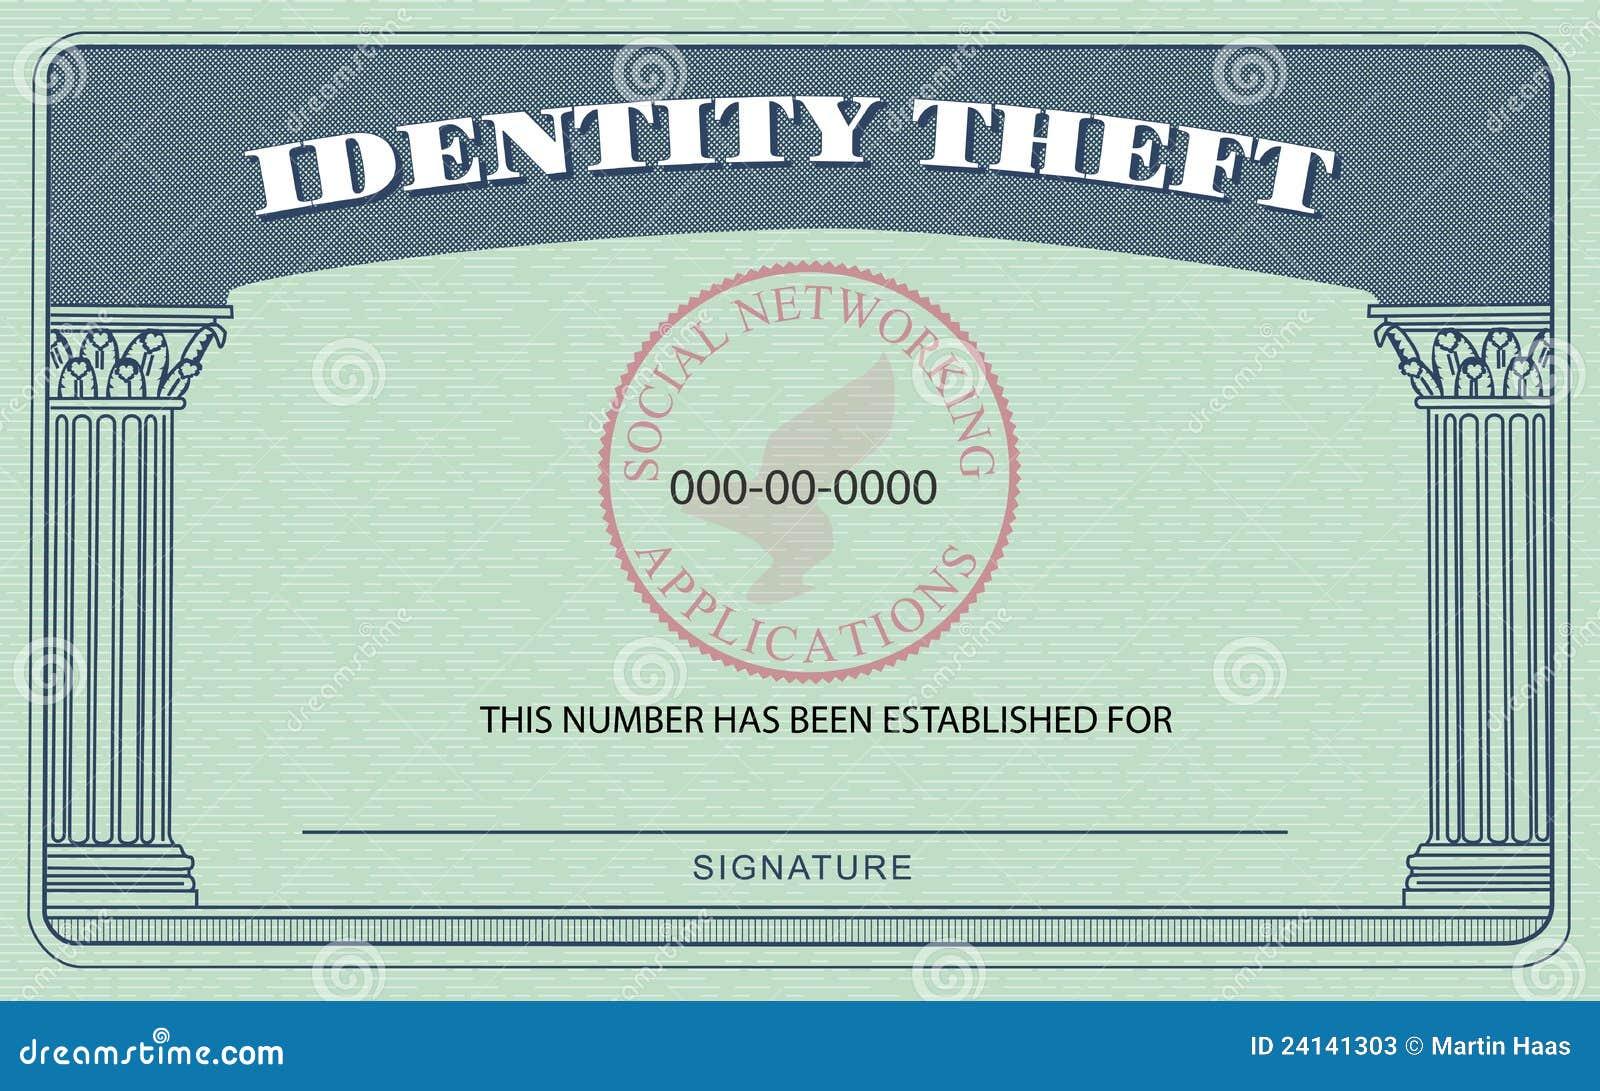 identity theft card stock illustration illustration of bogus 24141303